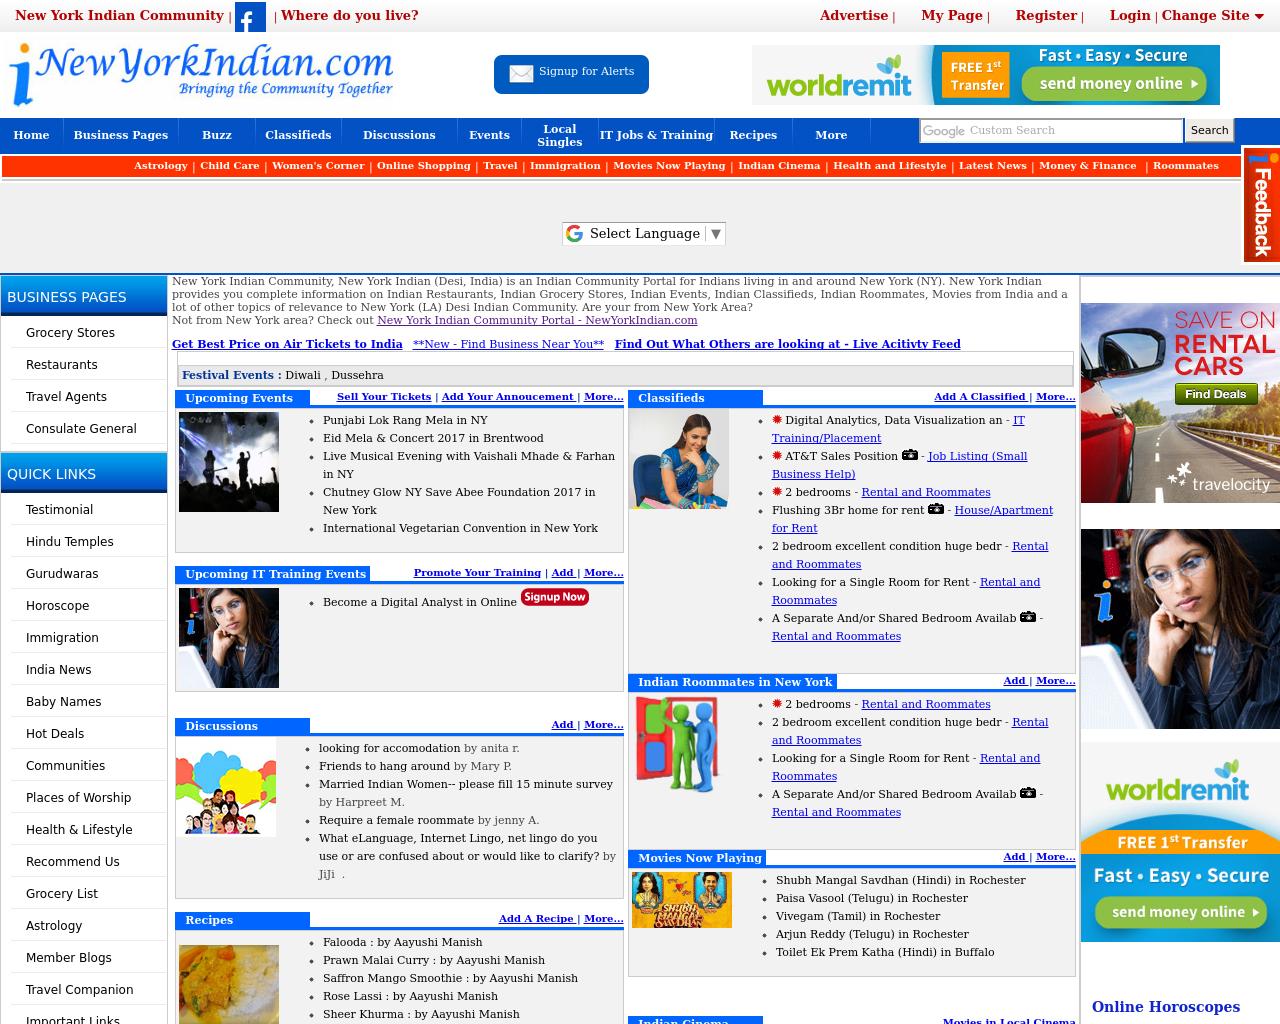 NewYorkindian.com-Advertising-Reviews-Pricing